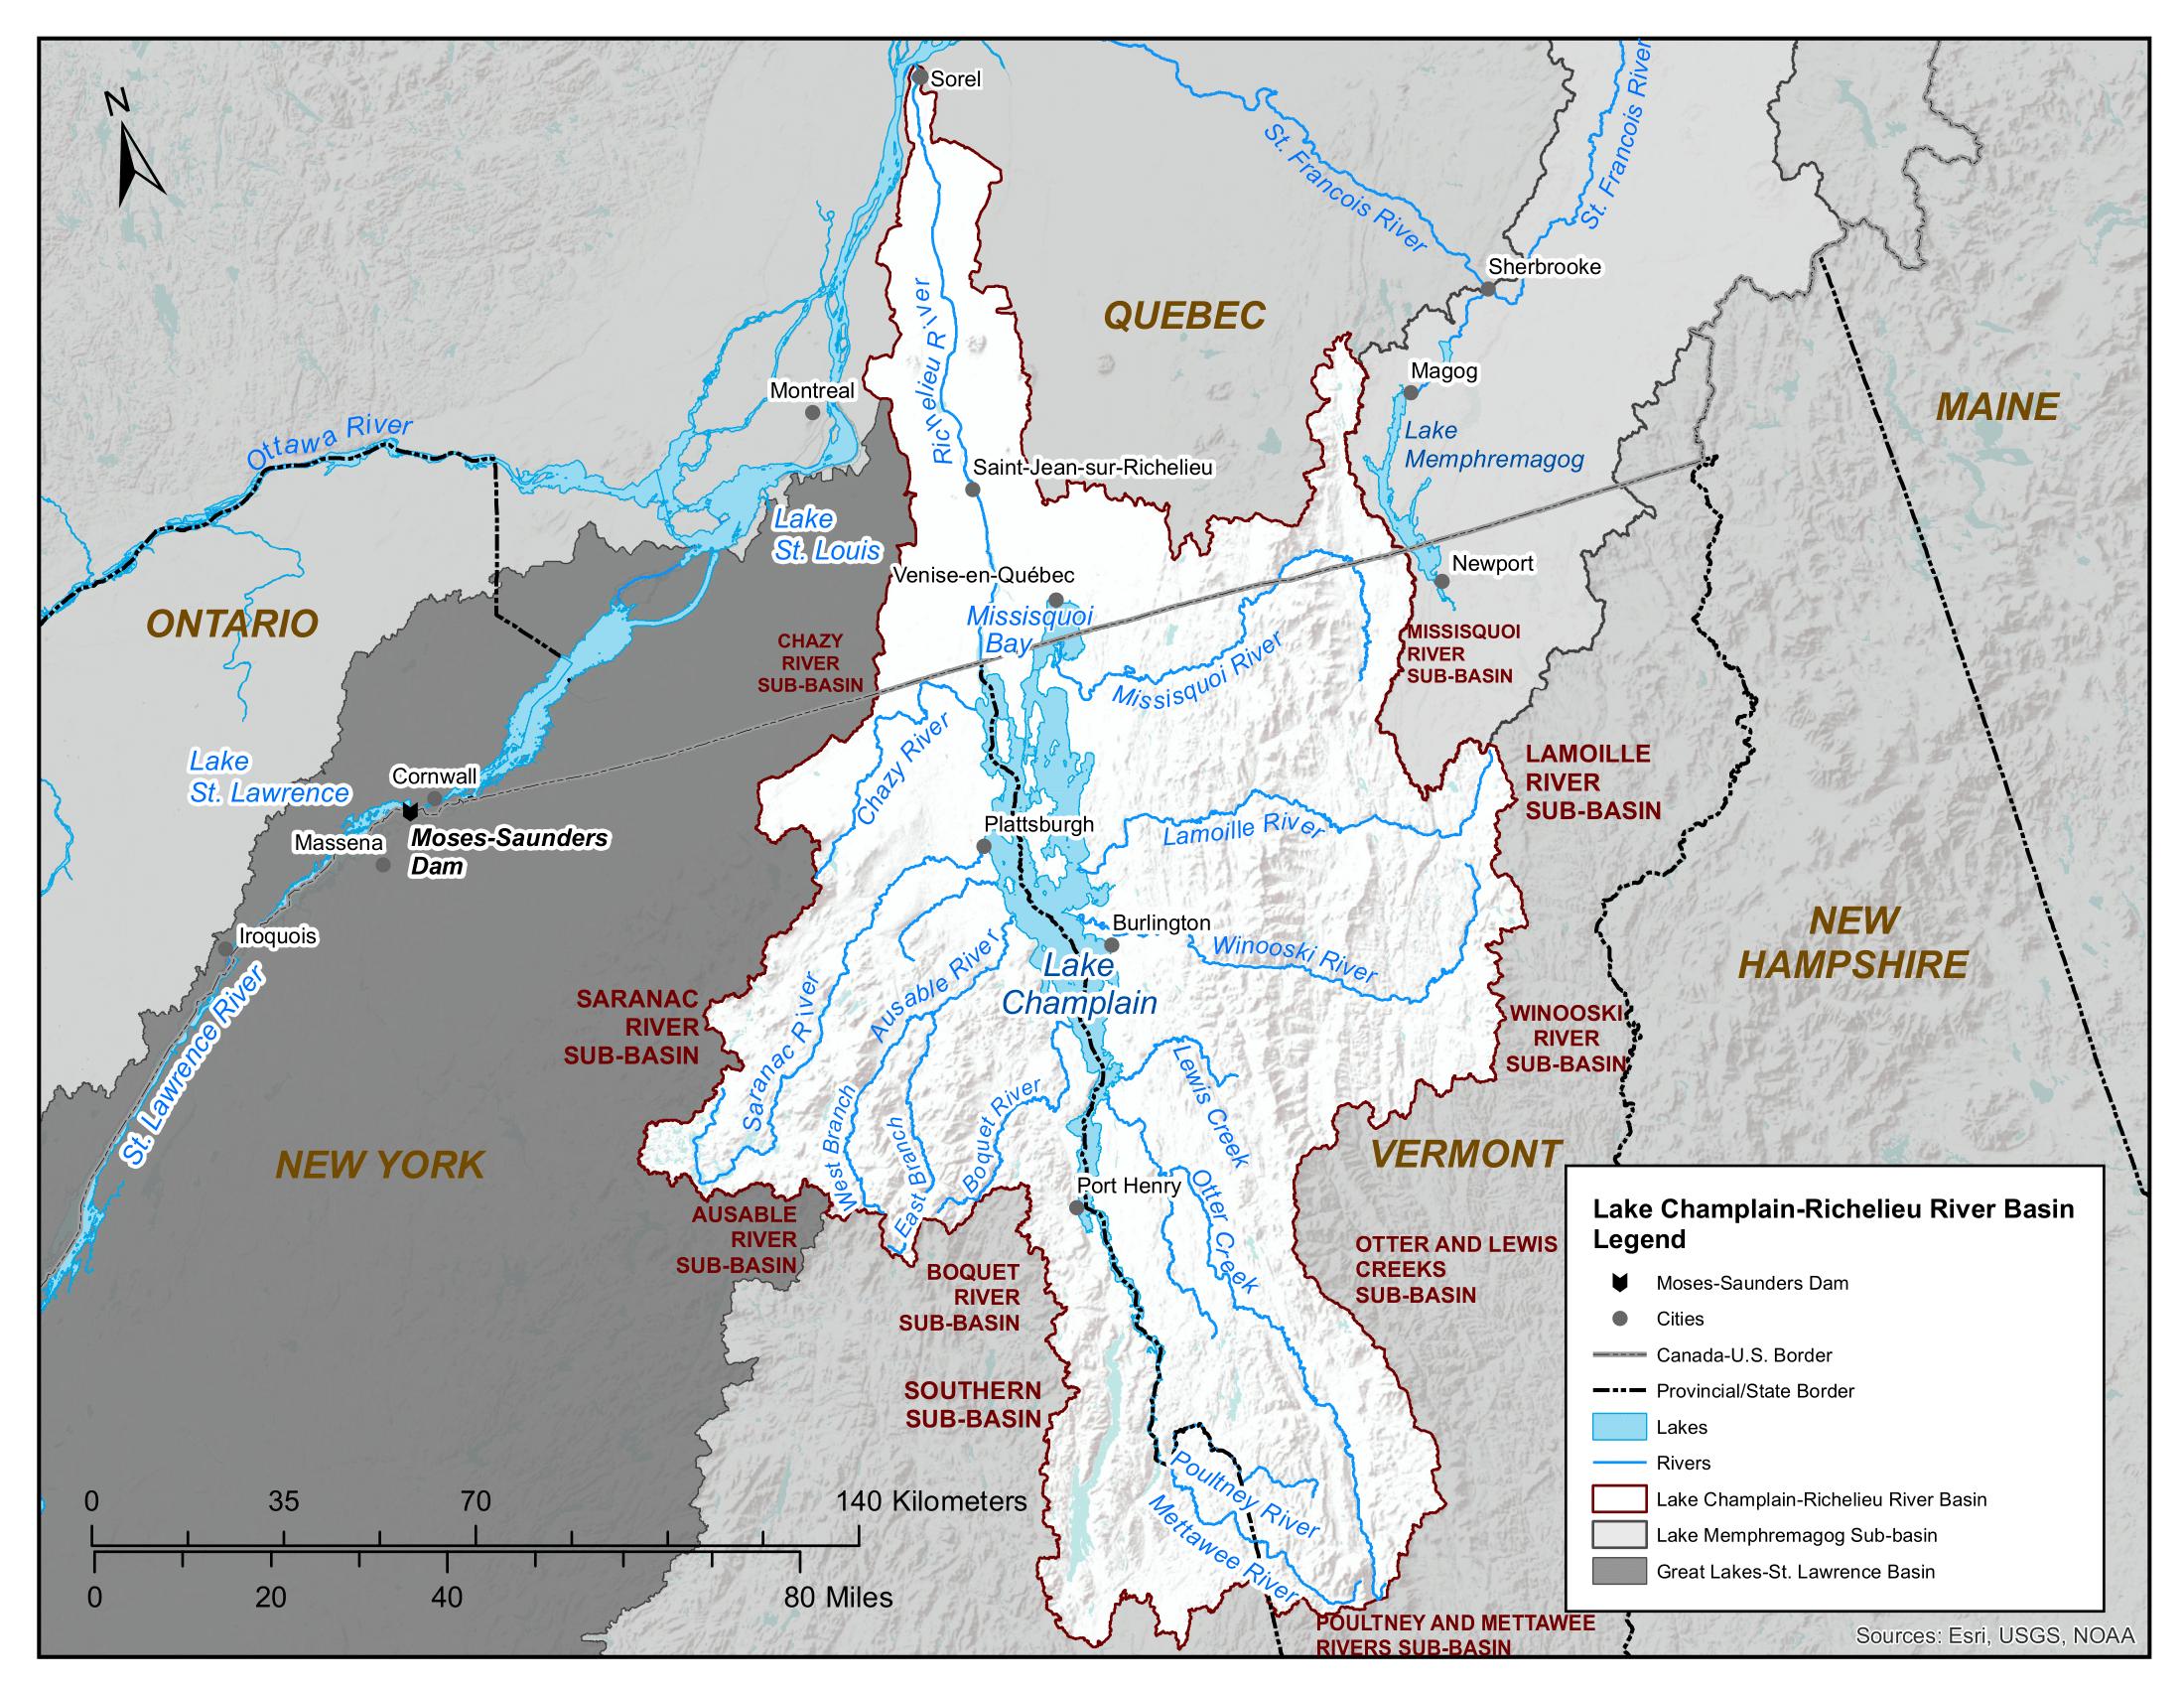 Lake Champlain and Richelieu River